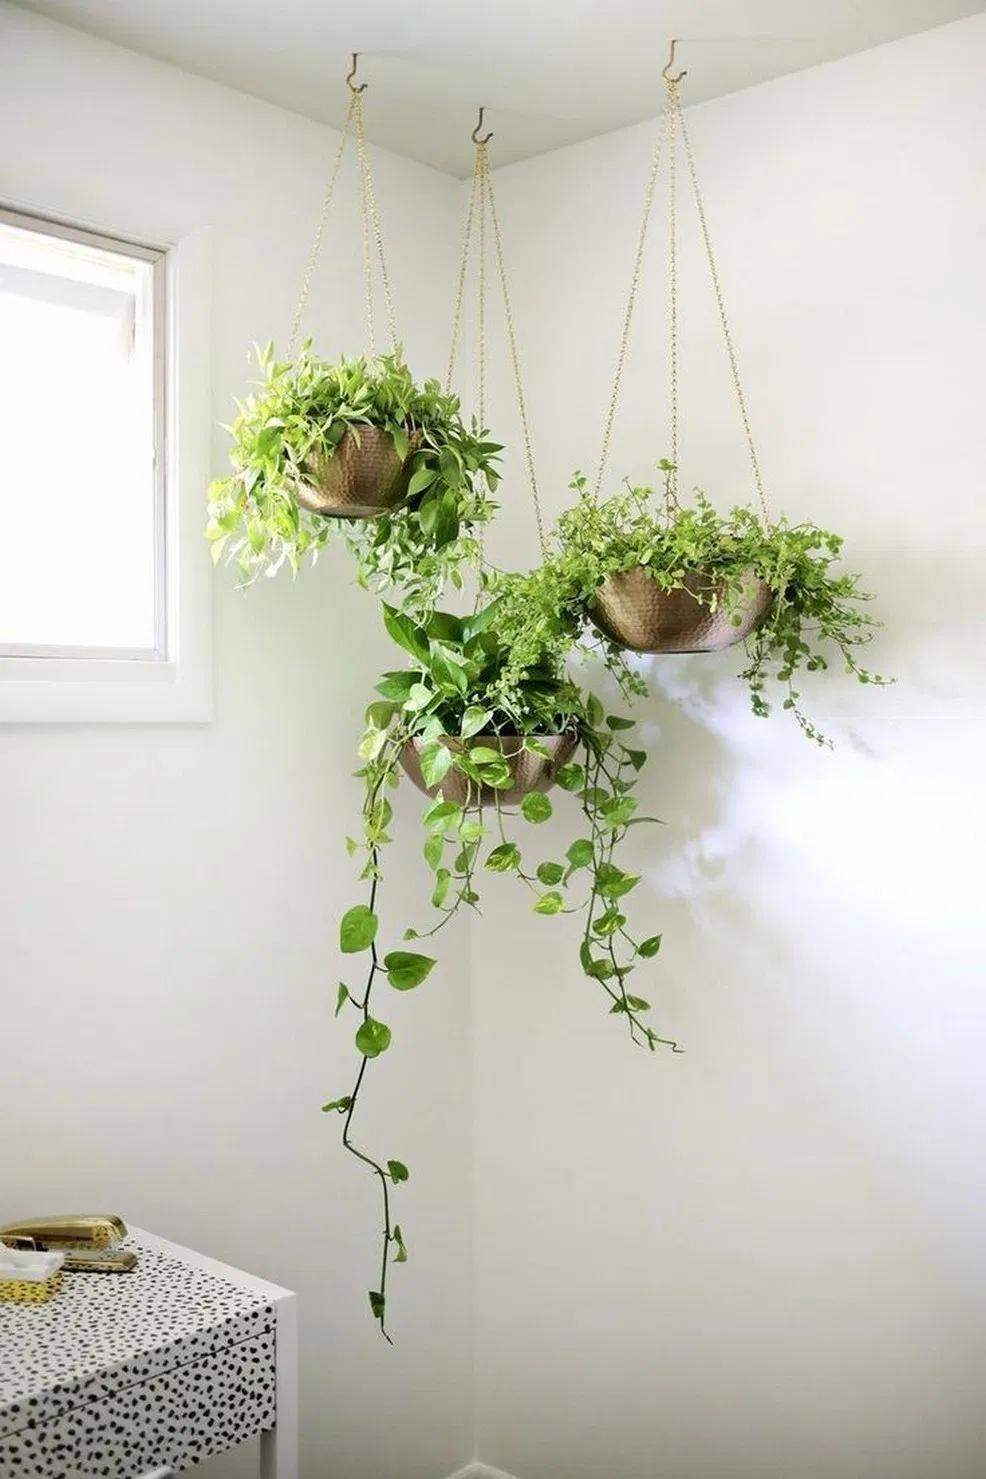 40 indoor hanging plants ideas to decorate your home 2 » cityofskies.com #indoorplantsdecor #indoorplantsdiy #indoorplantsideas #hangingplantsindoor